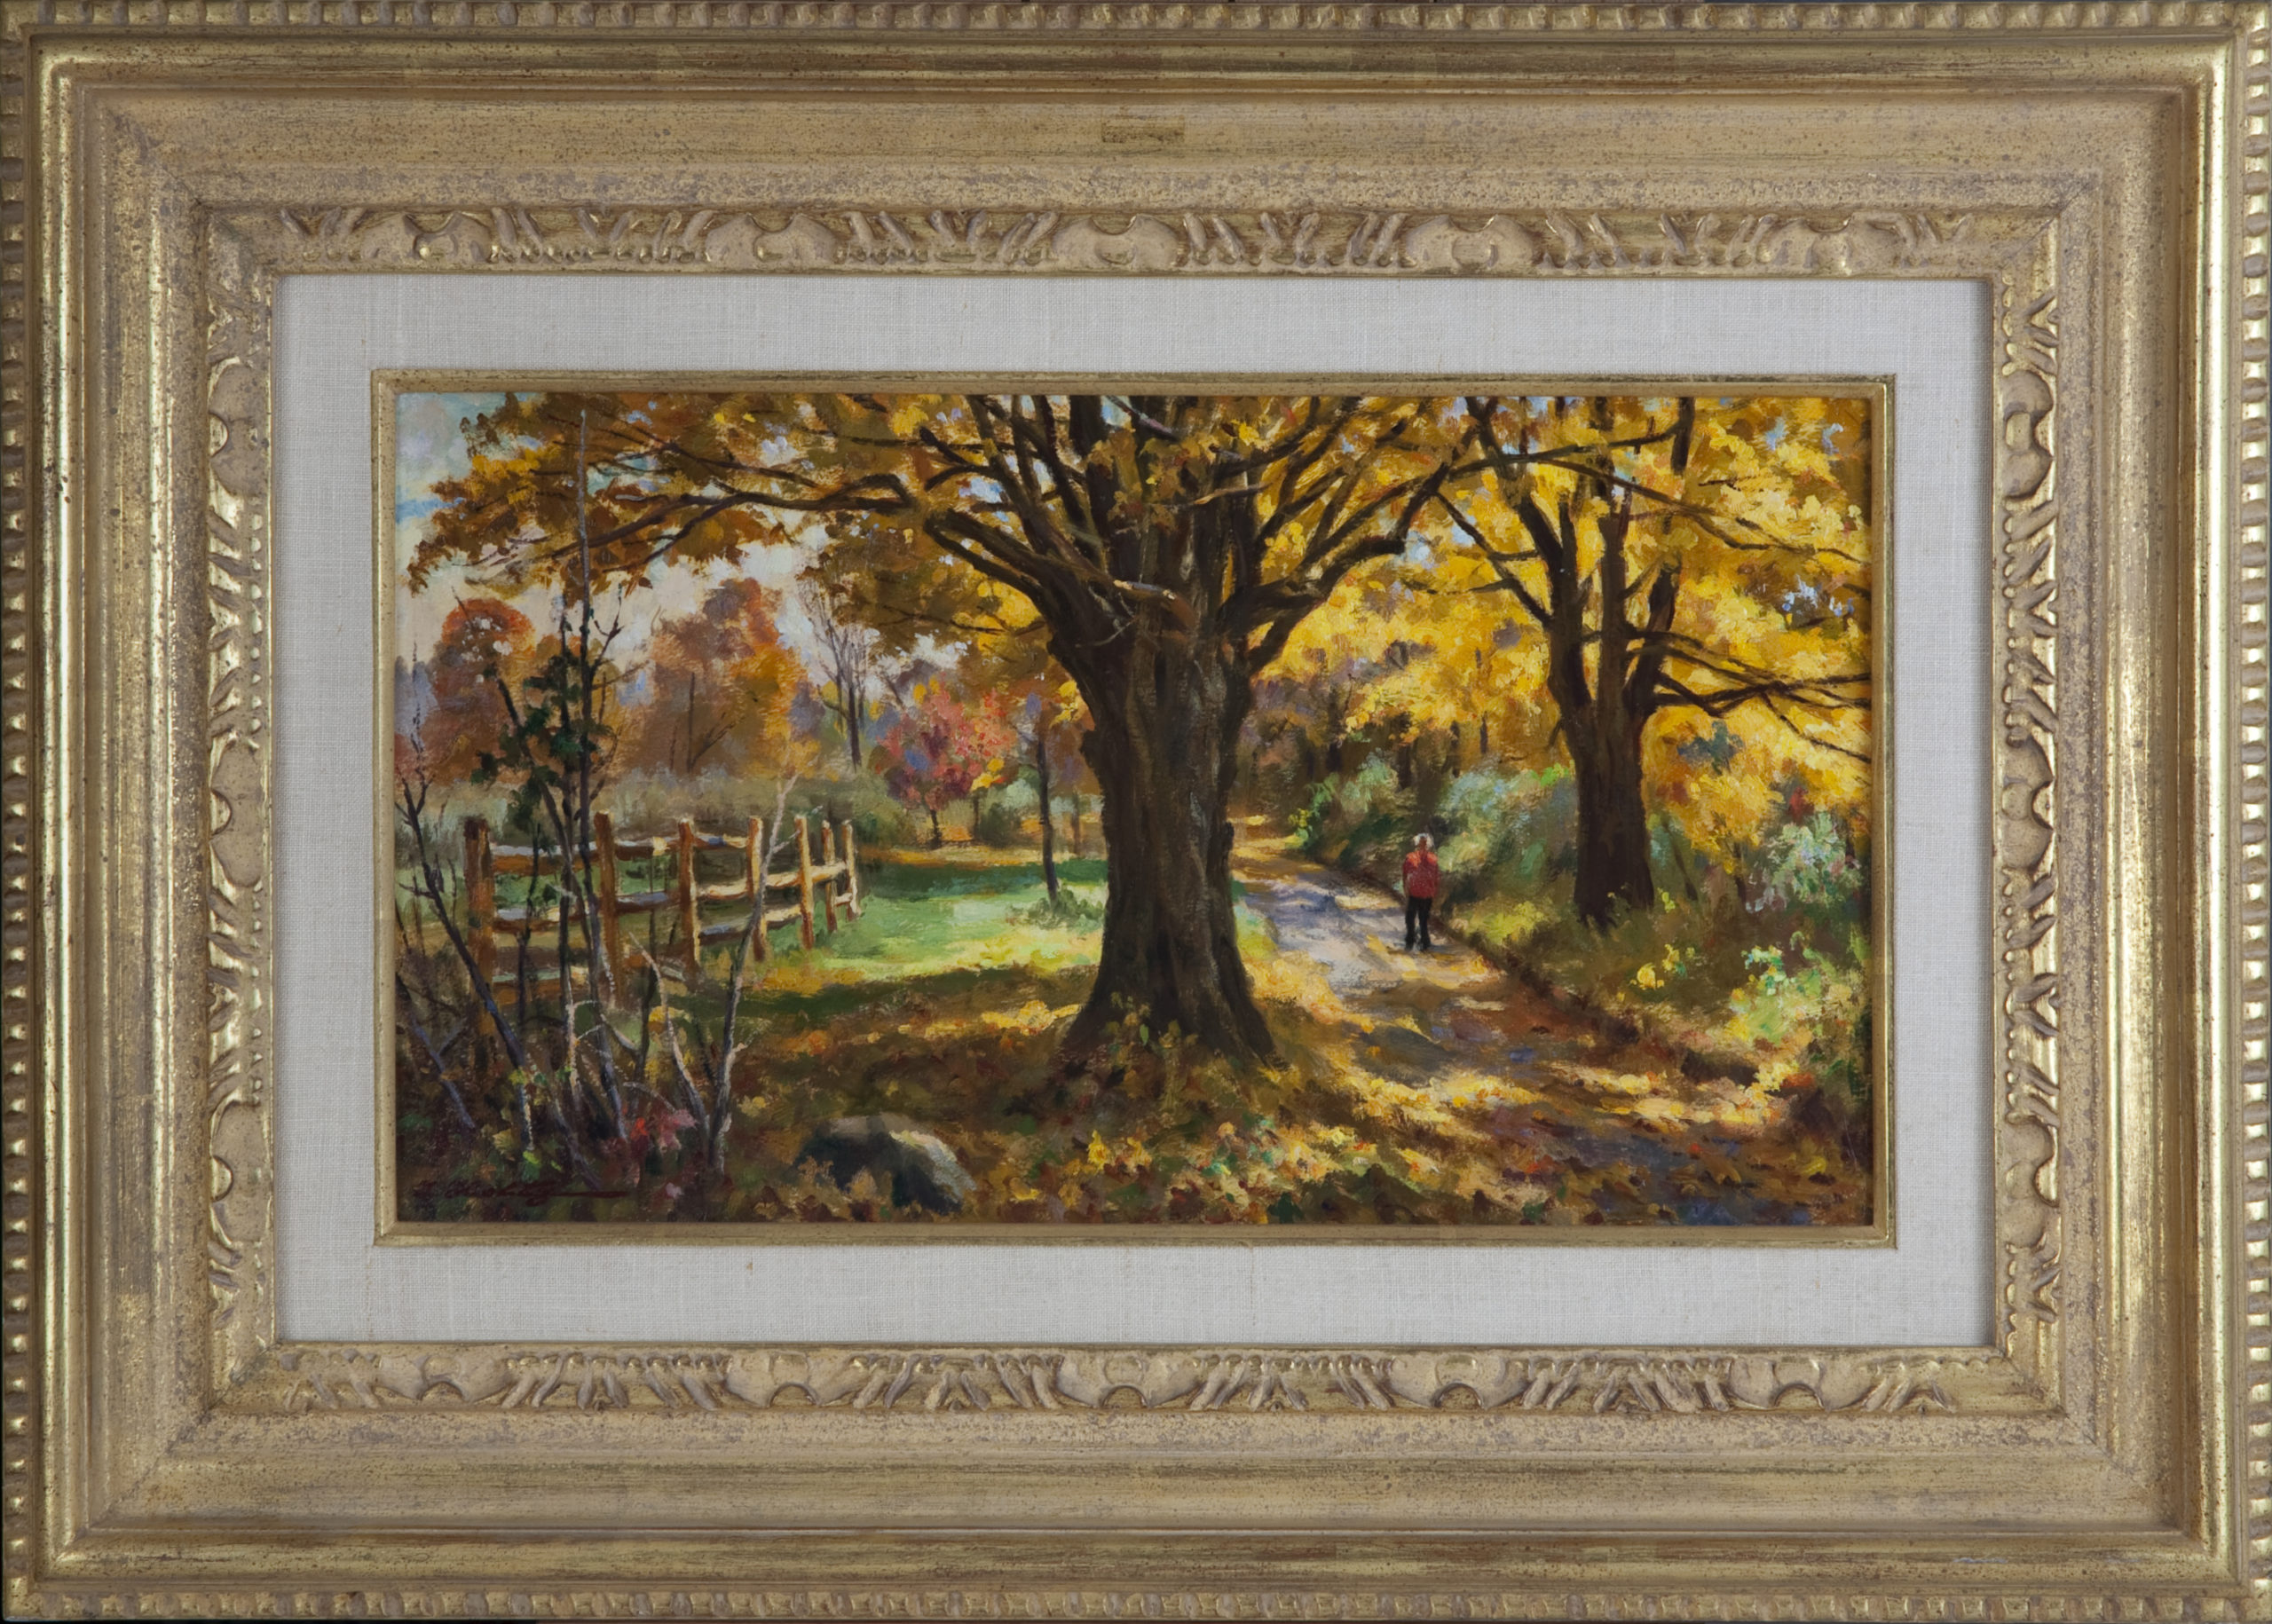 068 Autumn Gold 1979 - Oil on Masonite - 18 x 10 - Frame: 27 x 19 x 2